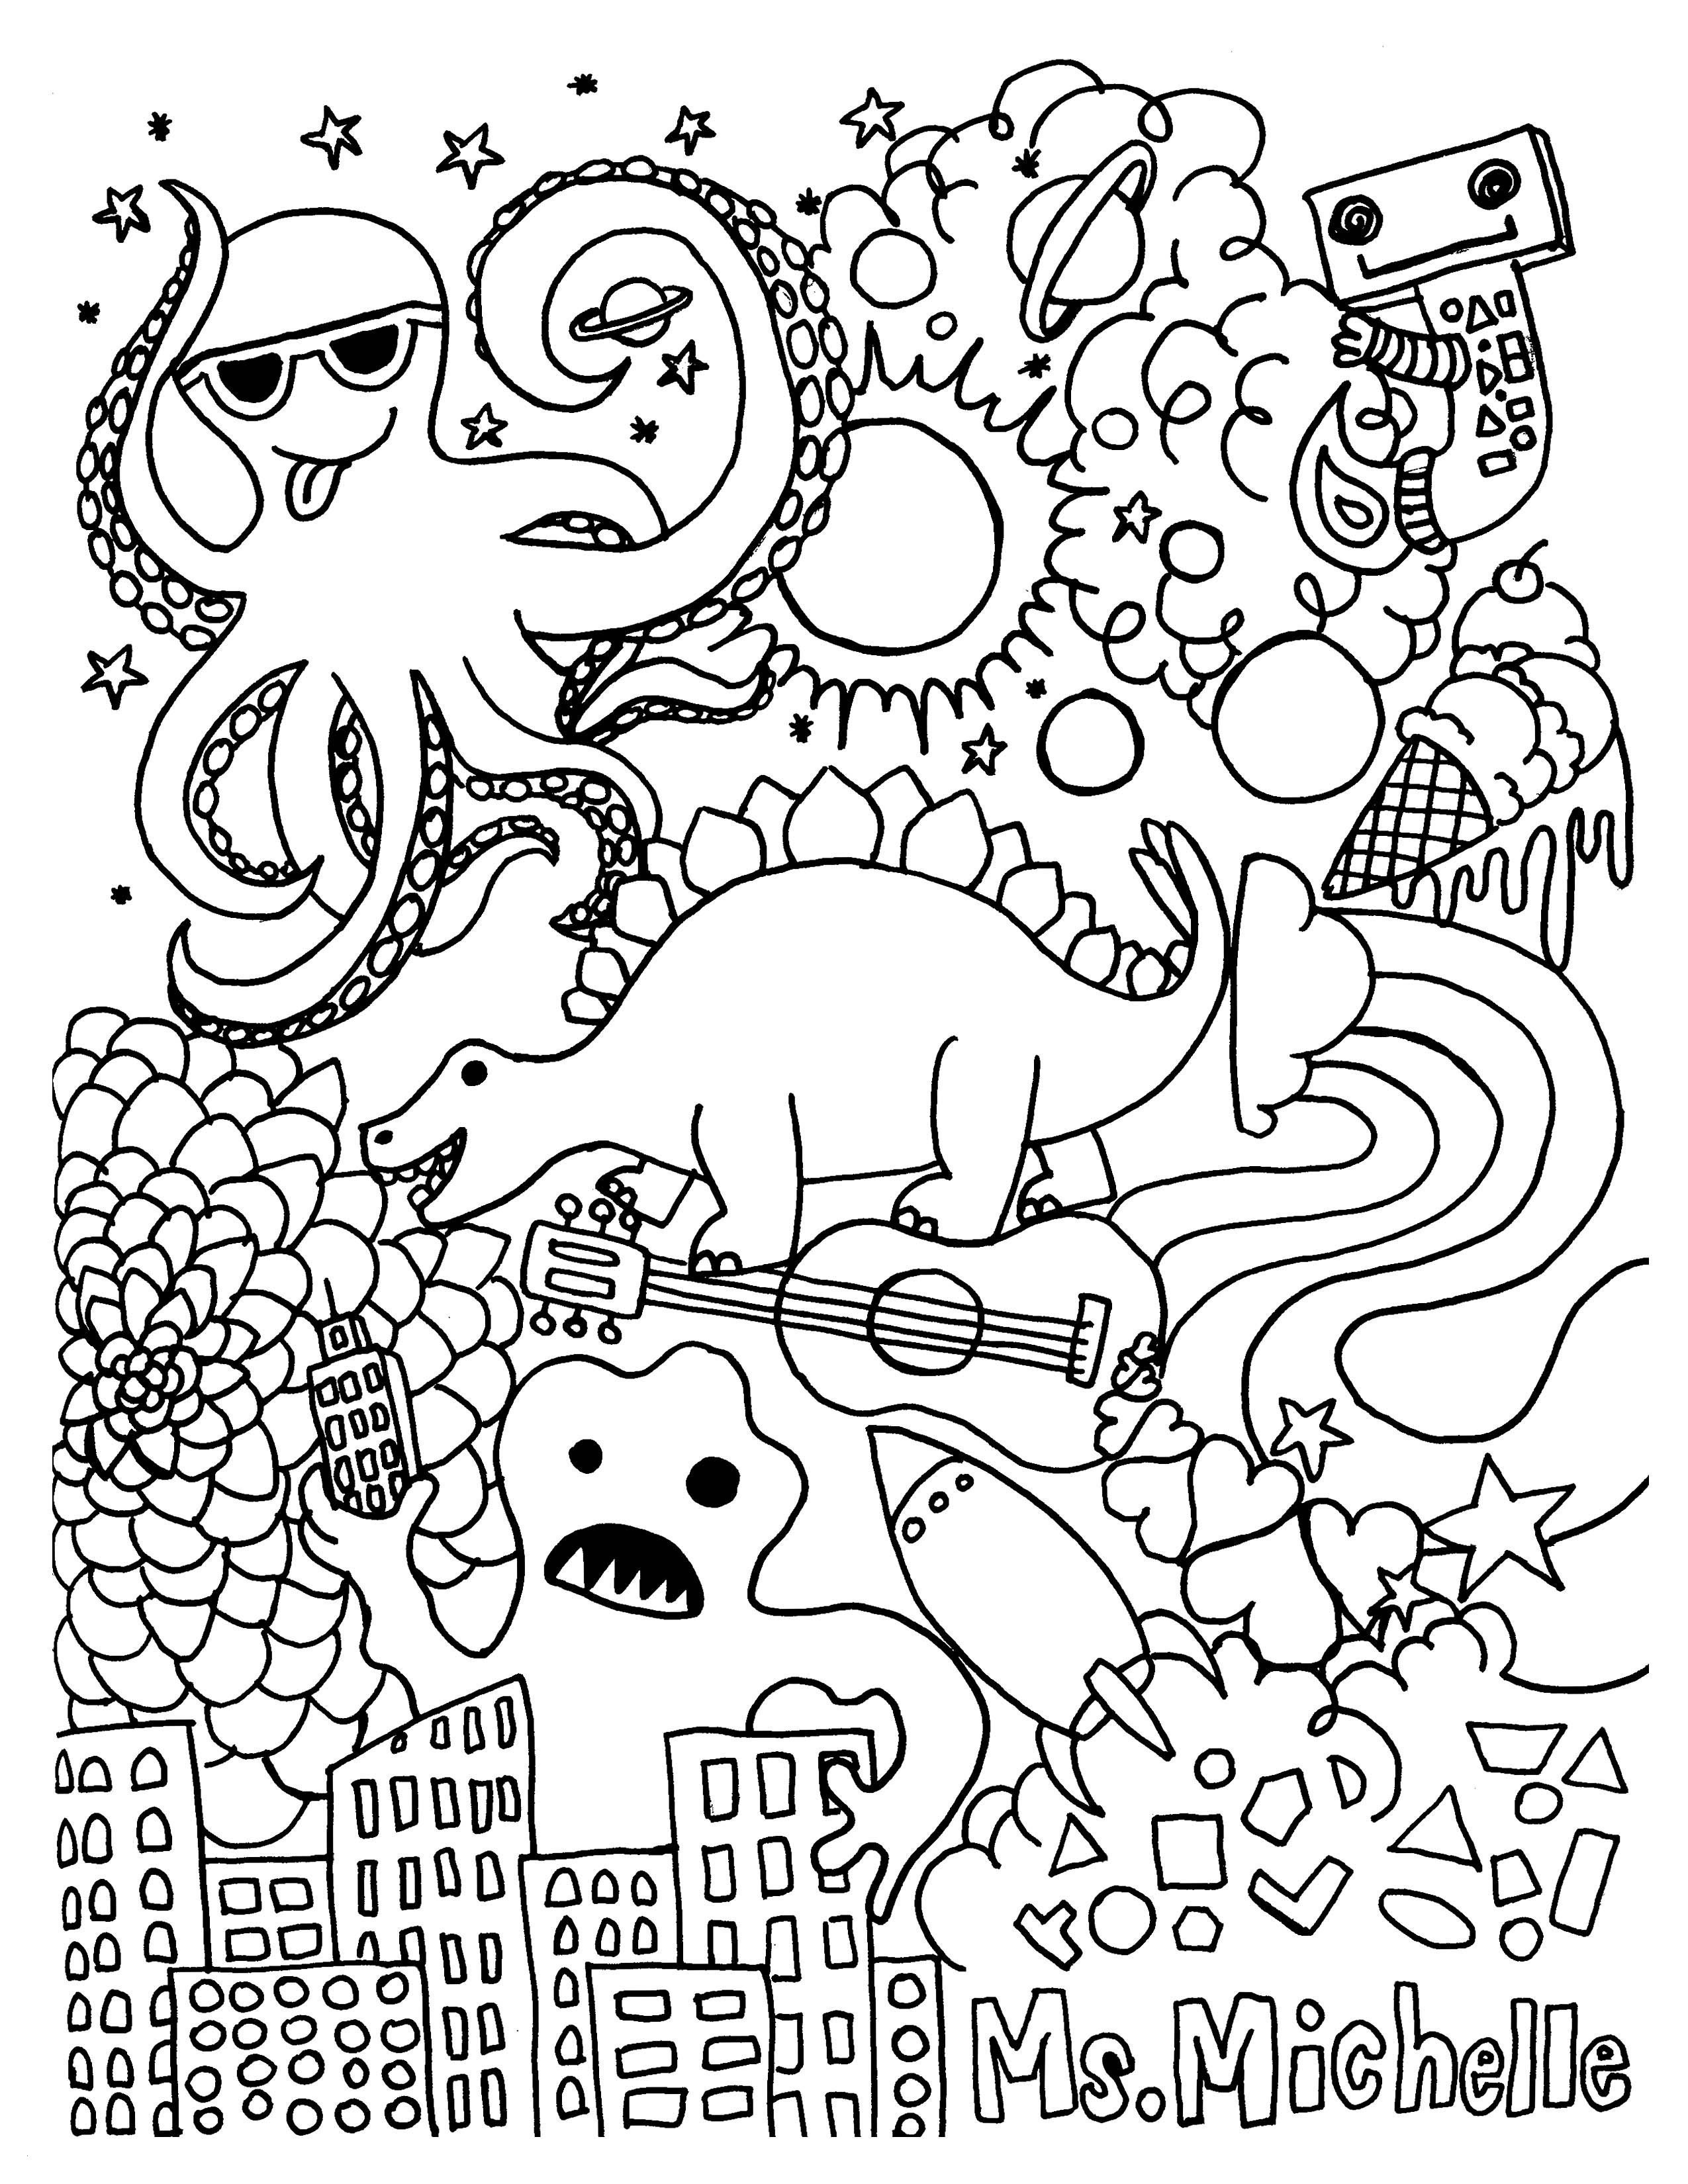 Ausmalbilder Pj Masks Einzigartig 12 Owlette Coloring Page